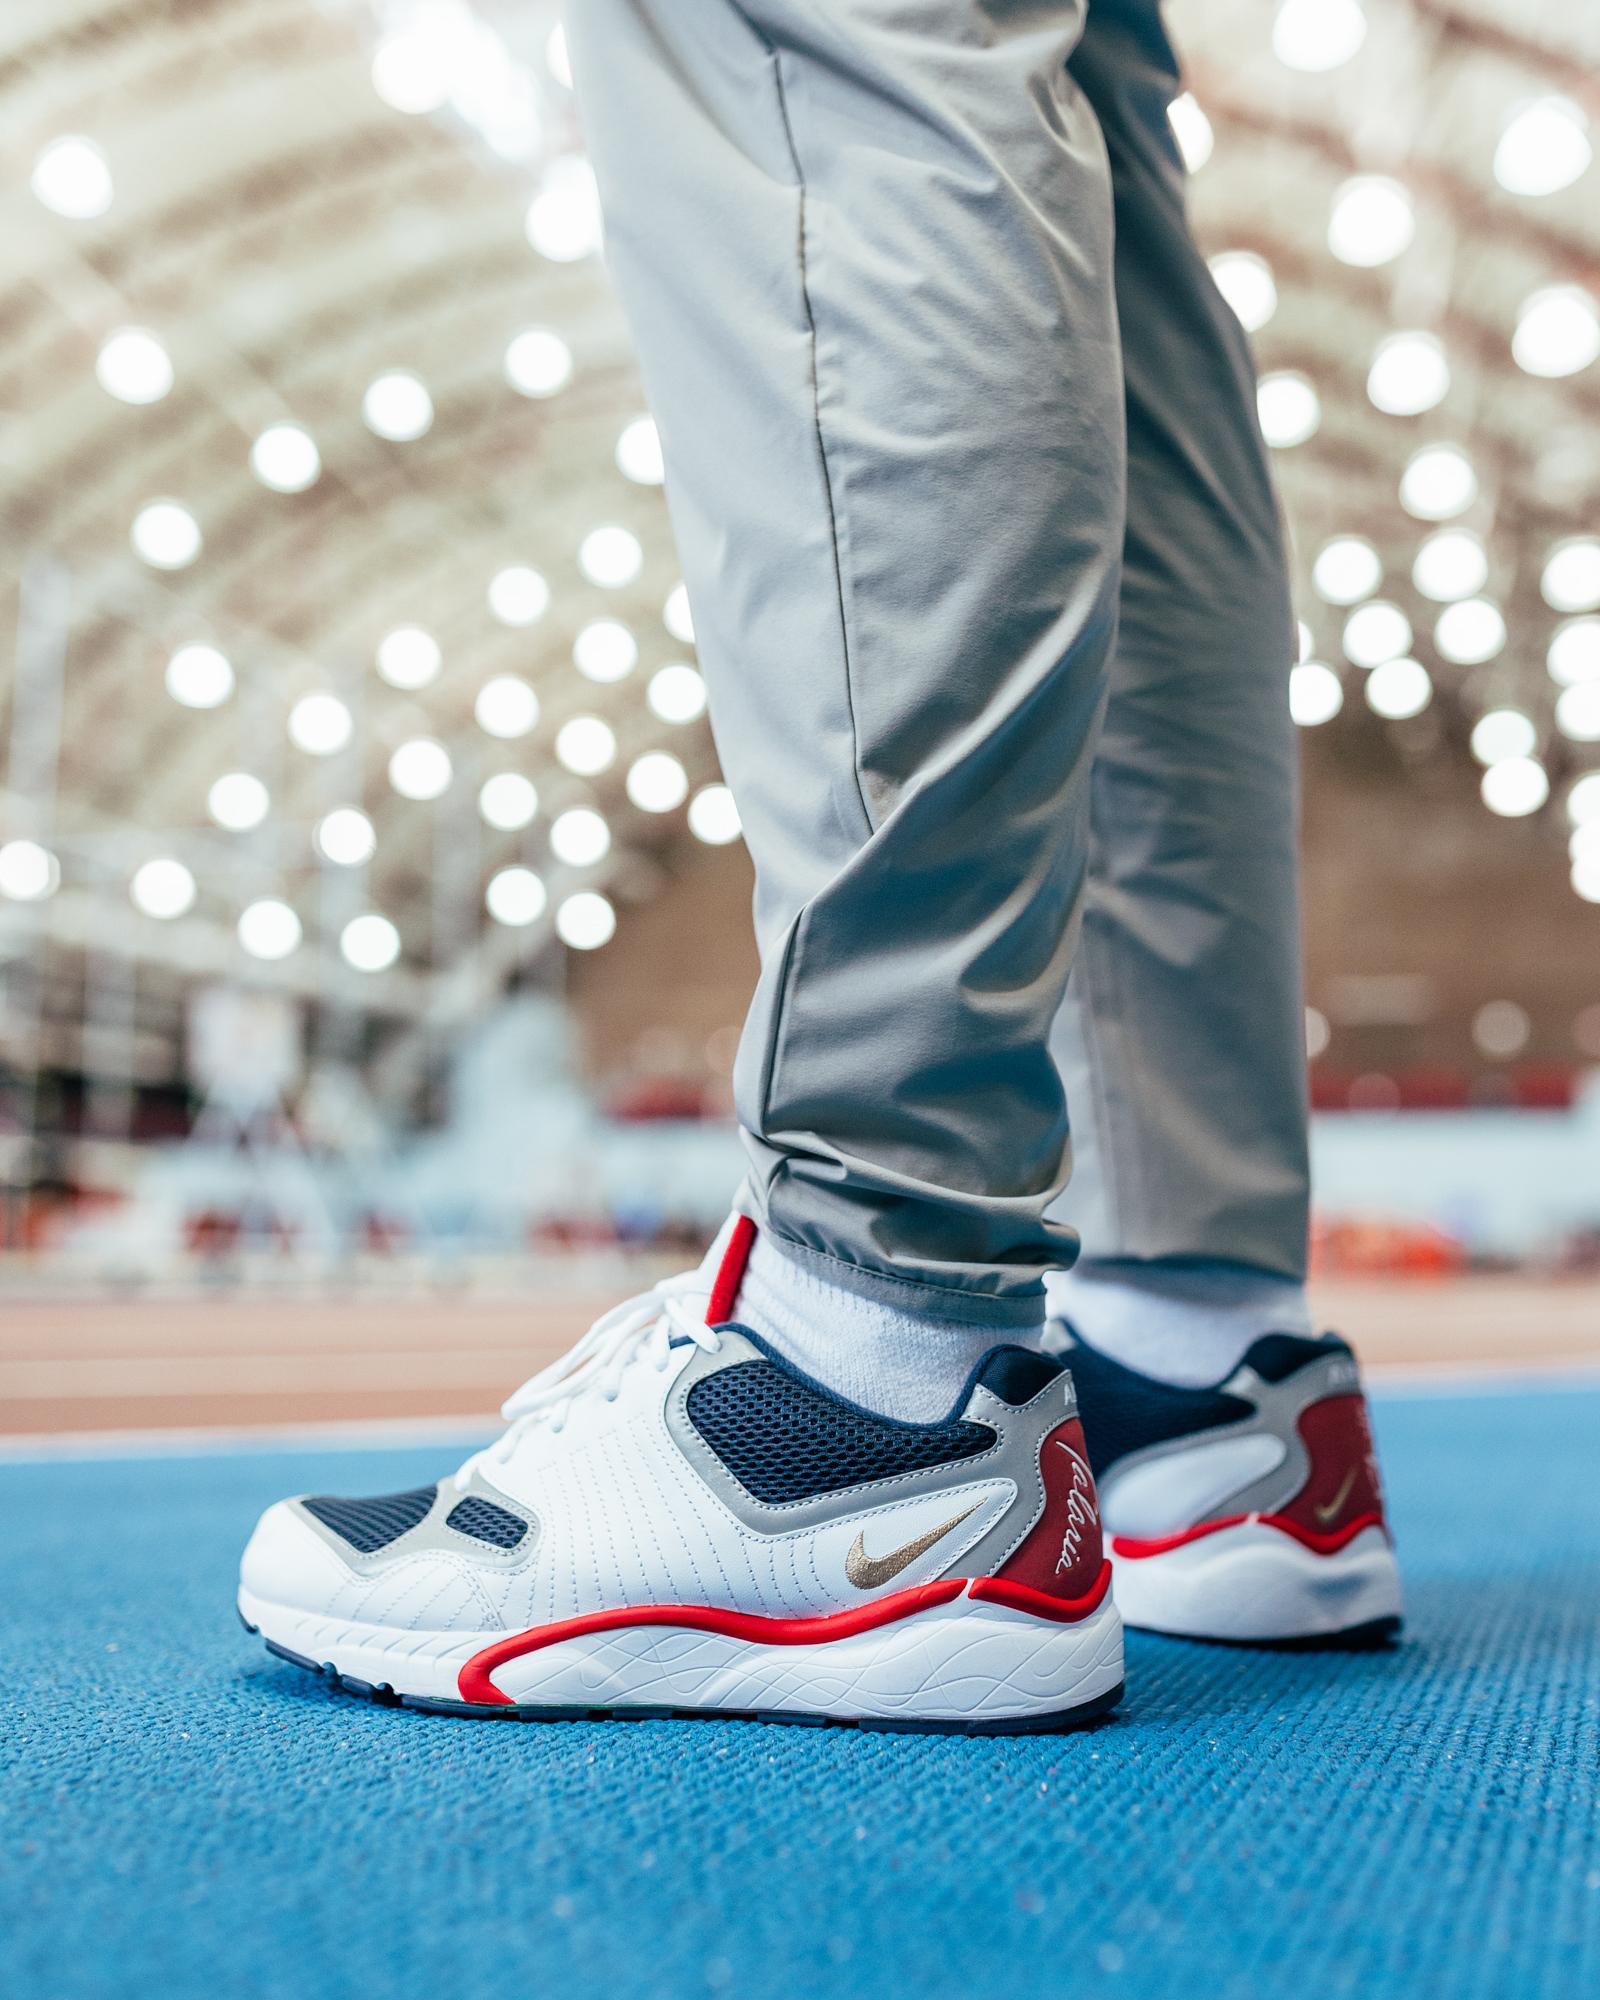 Image: KITH, Nike Talaria